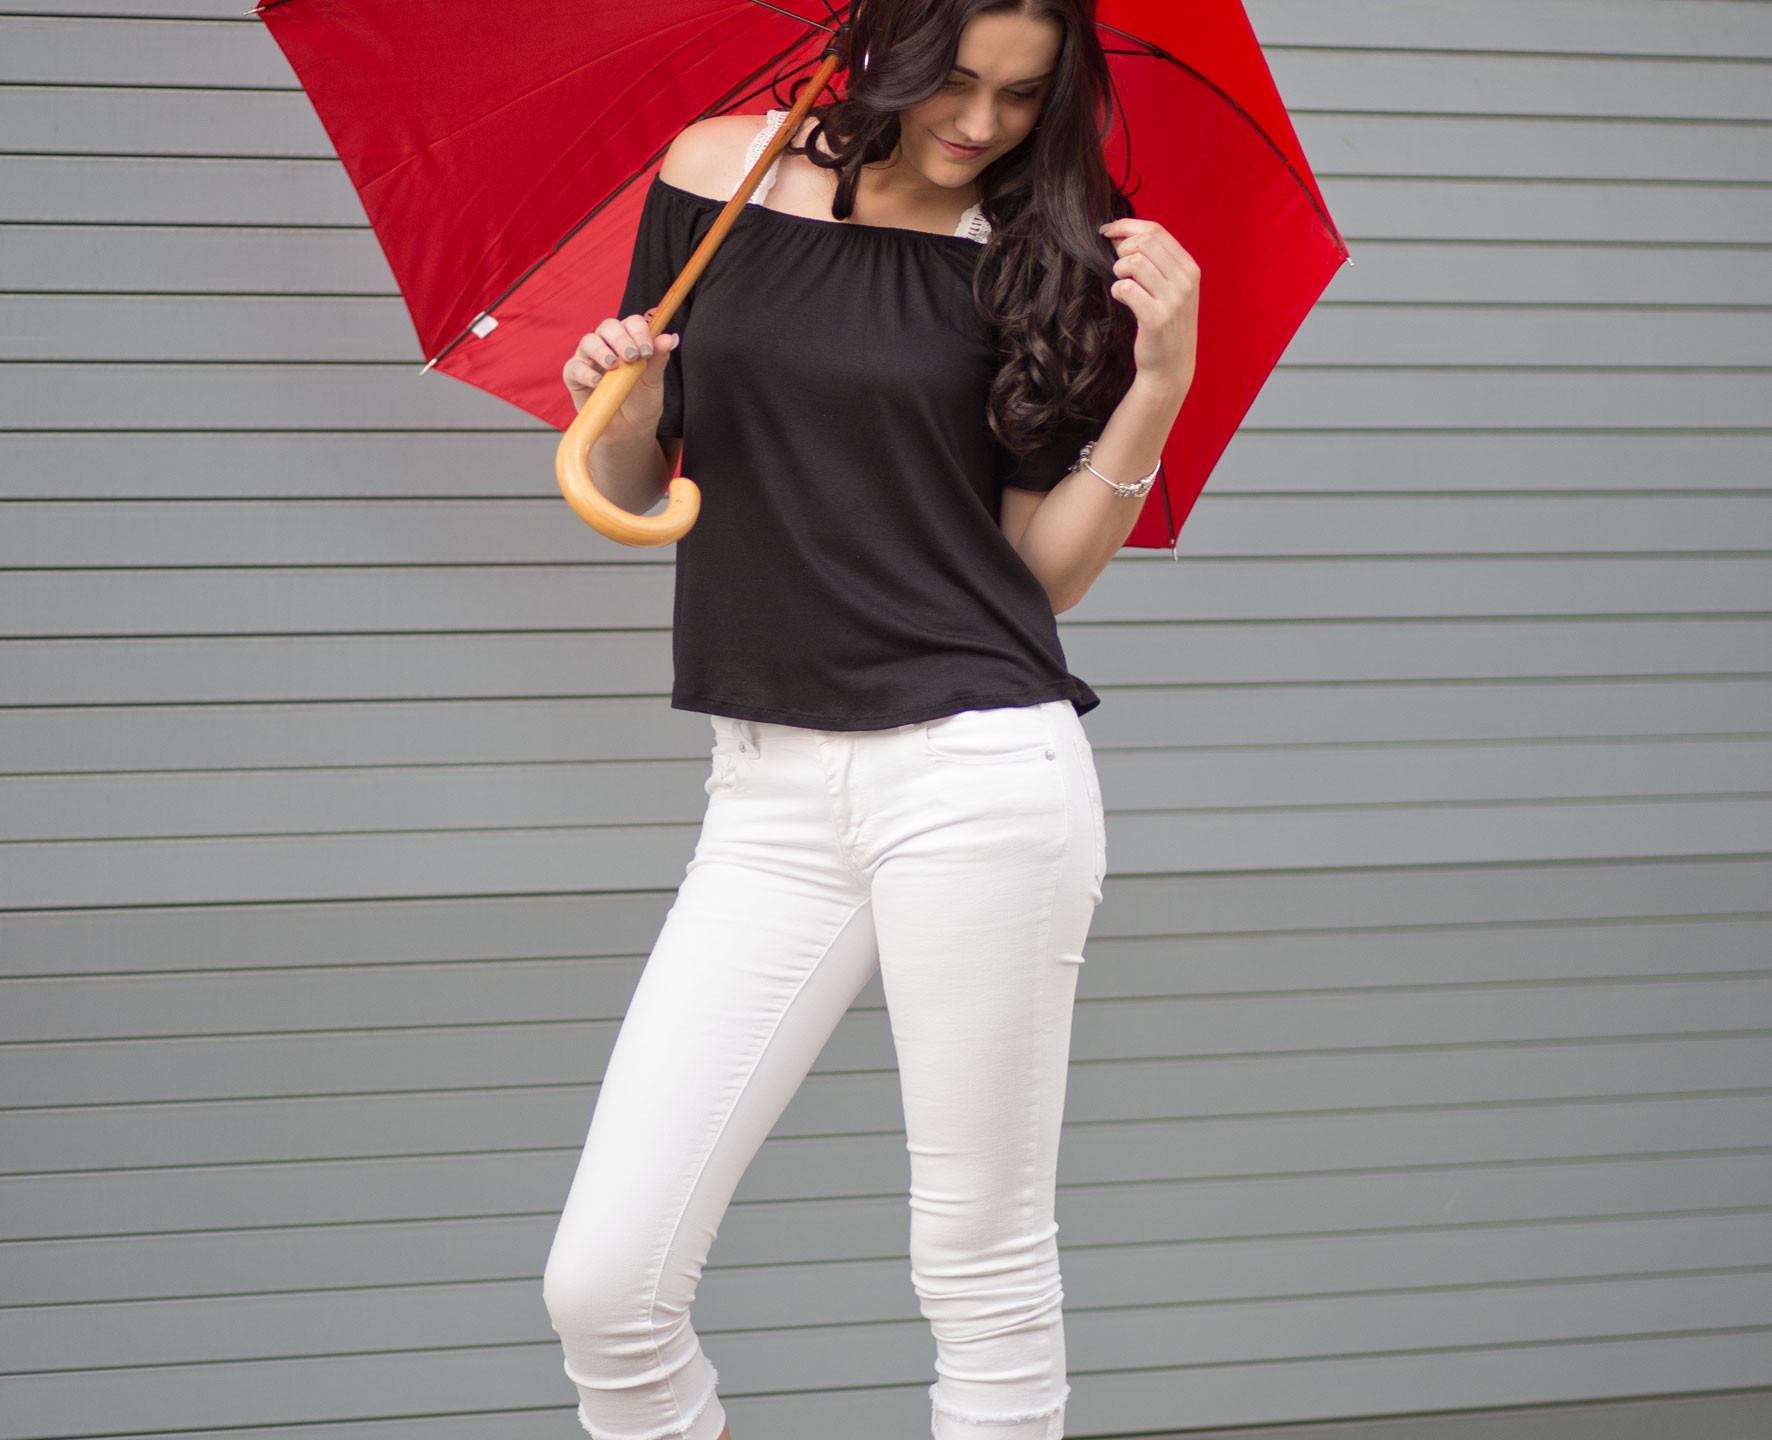 Loveland-Umbrella-Senior